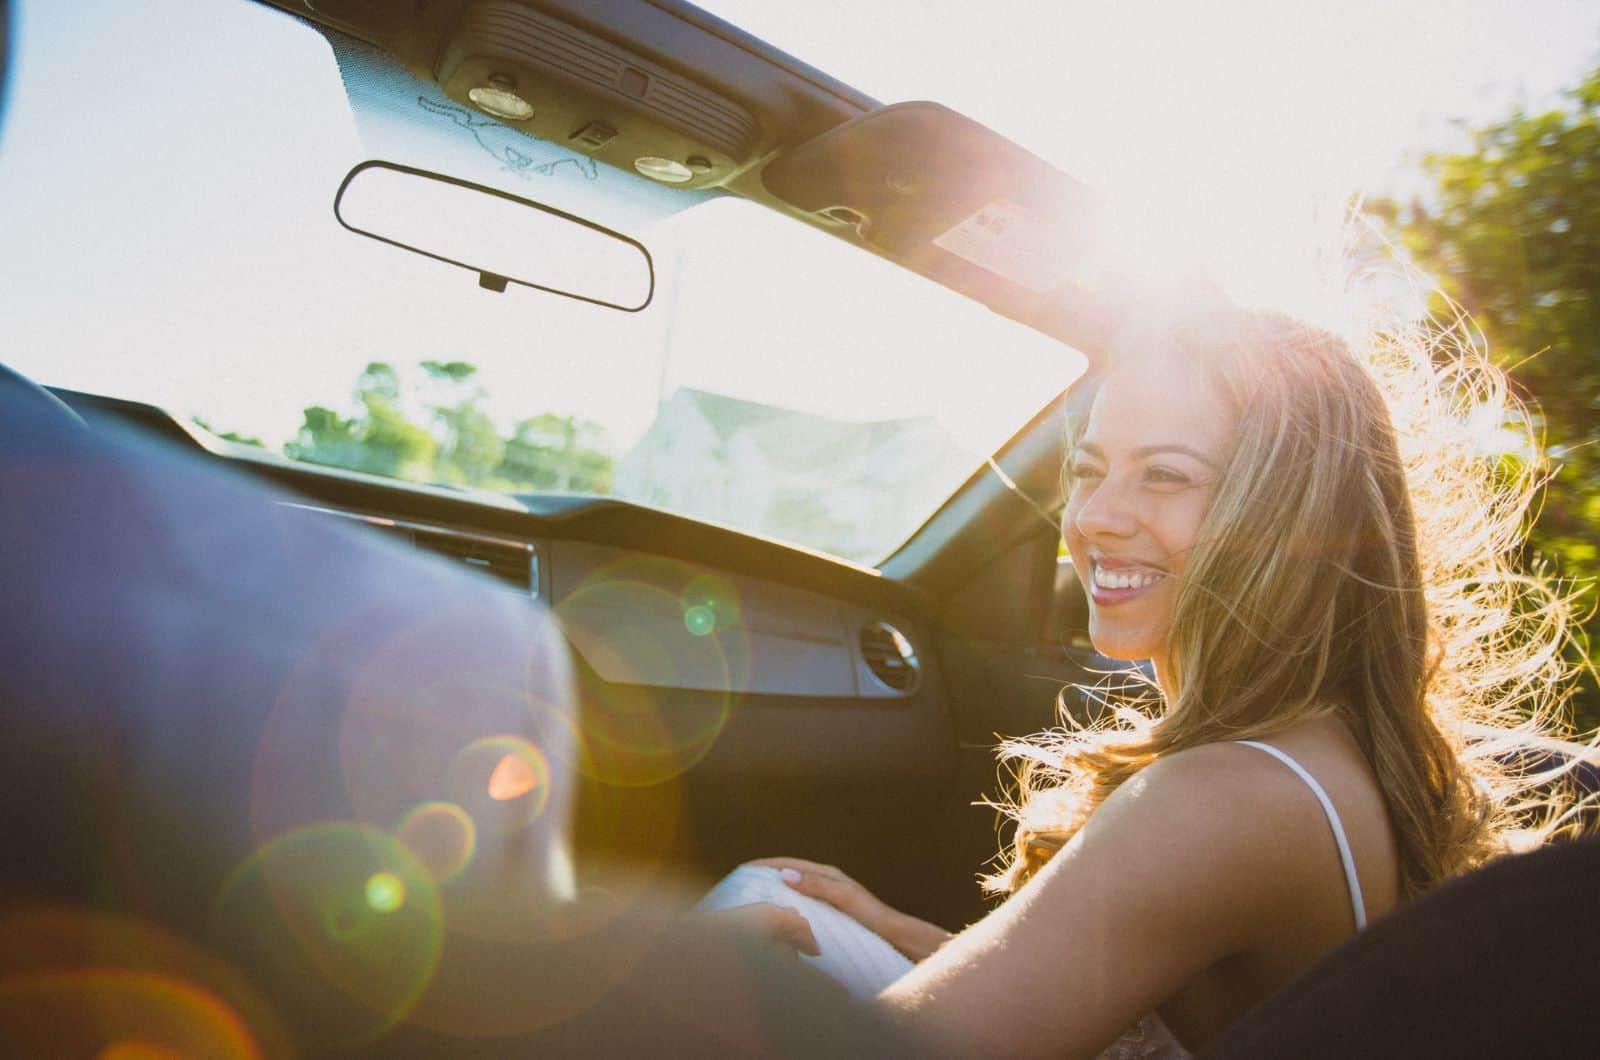 Frau im Auto lächelt